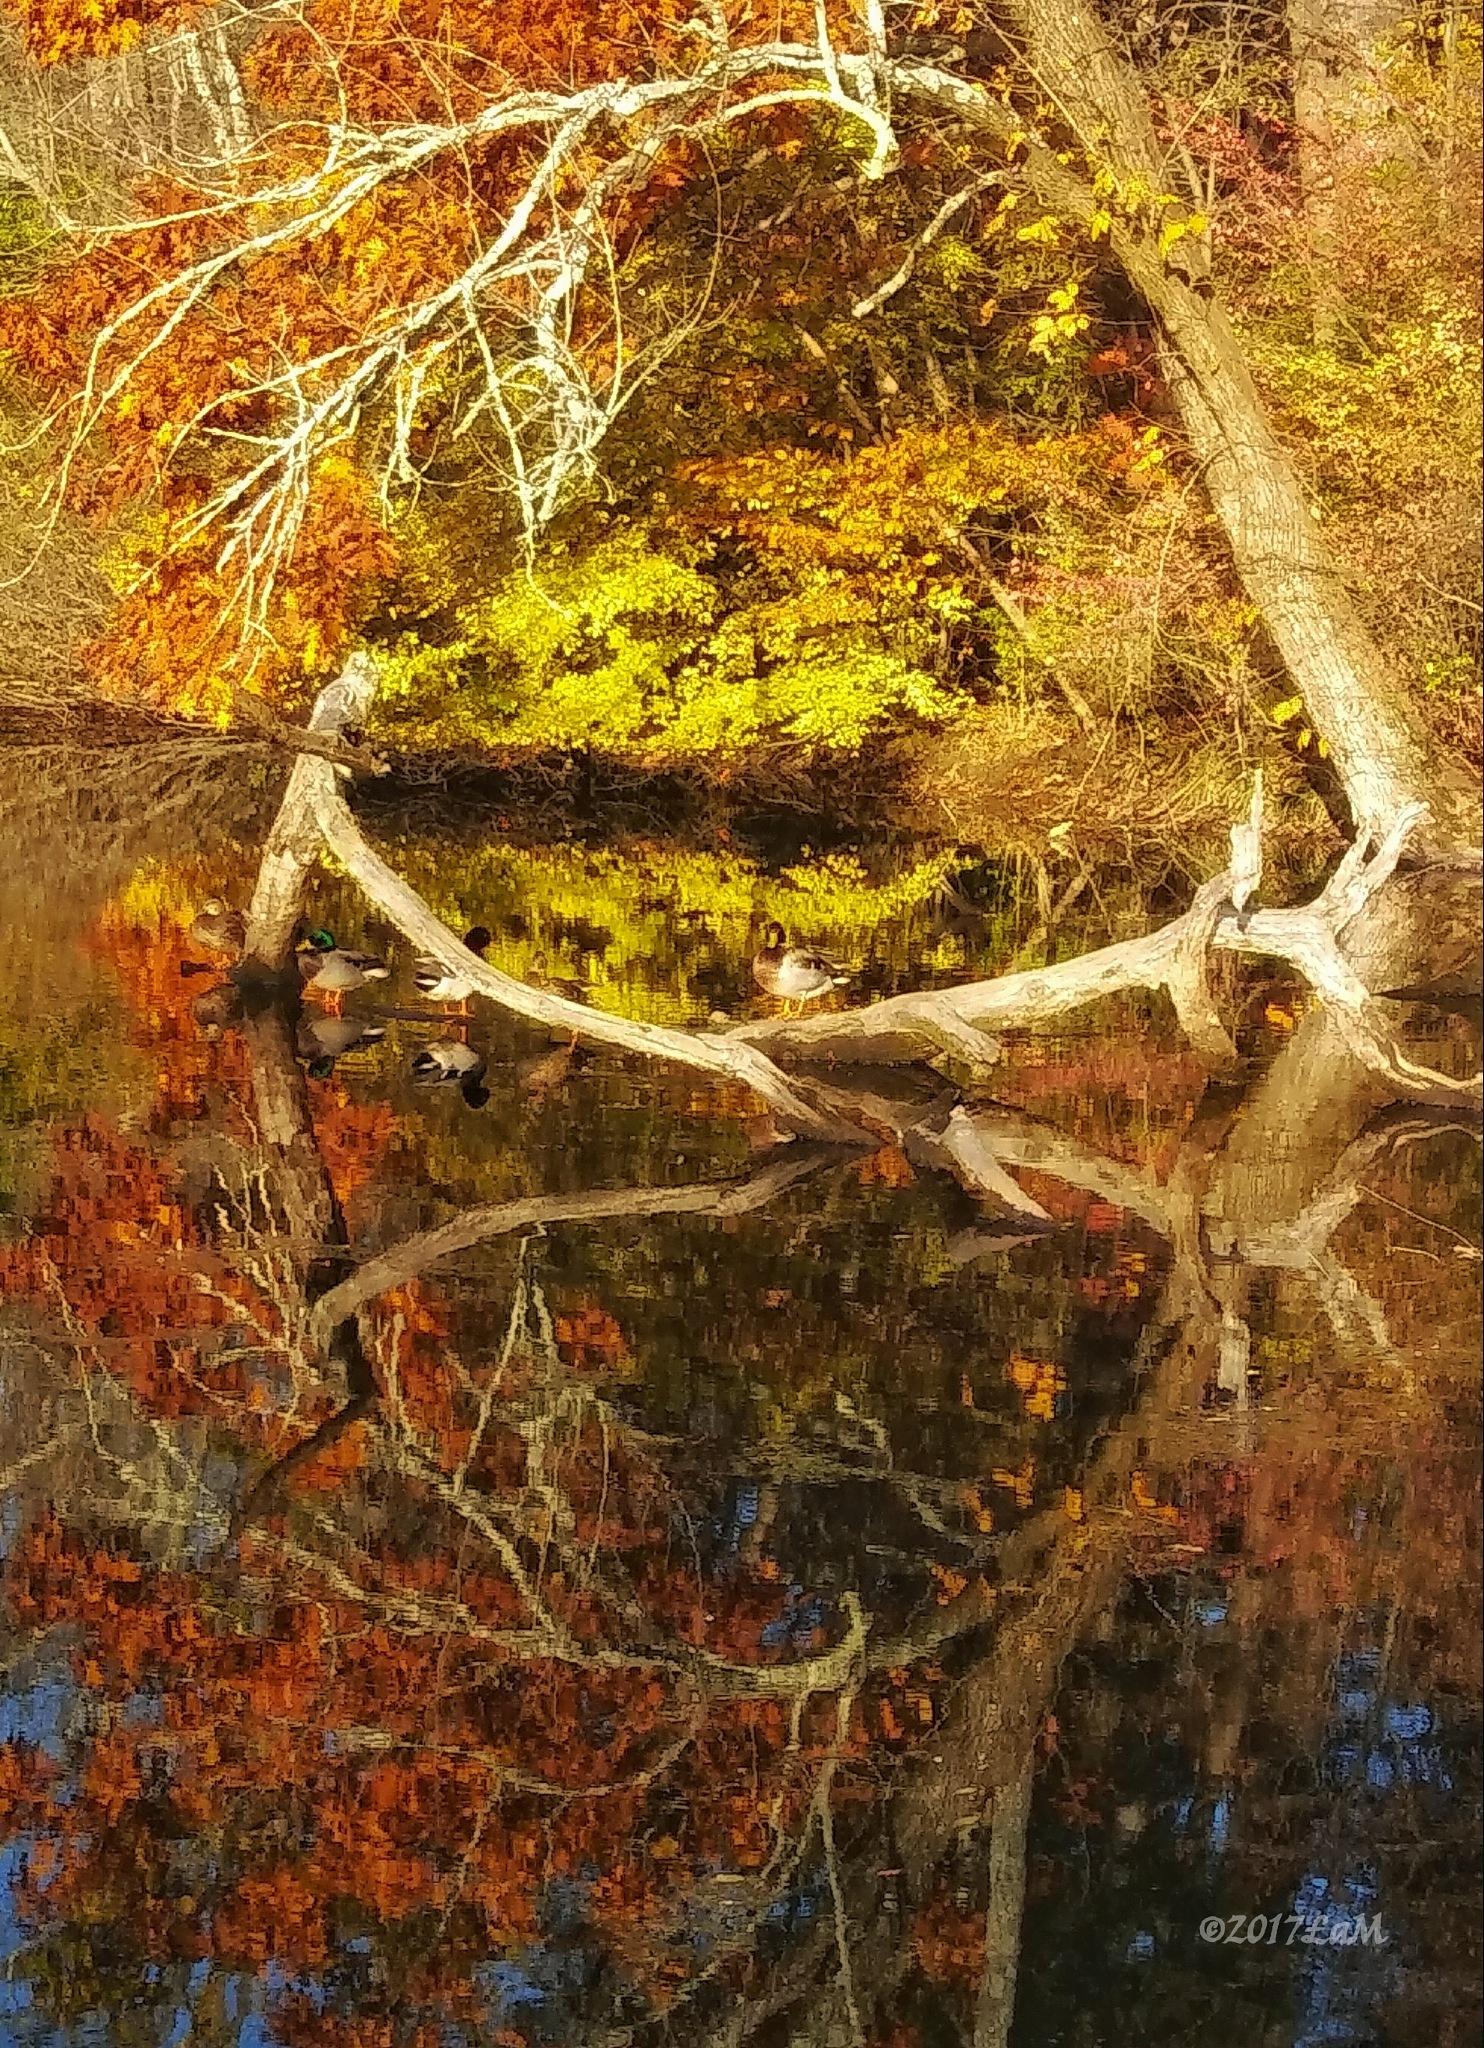 ducks in Autumn by Lisa A Manco